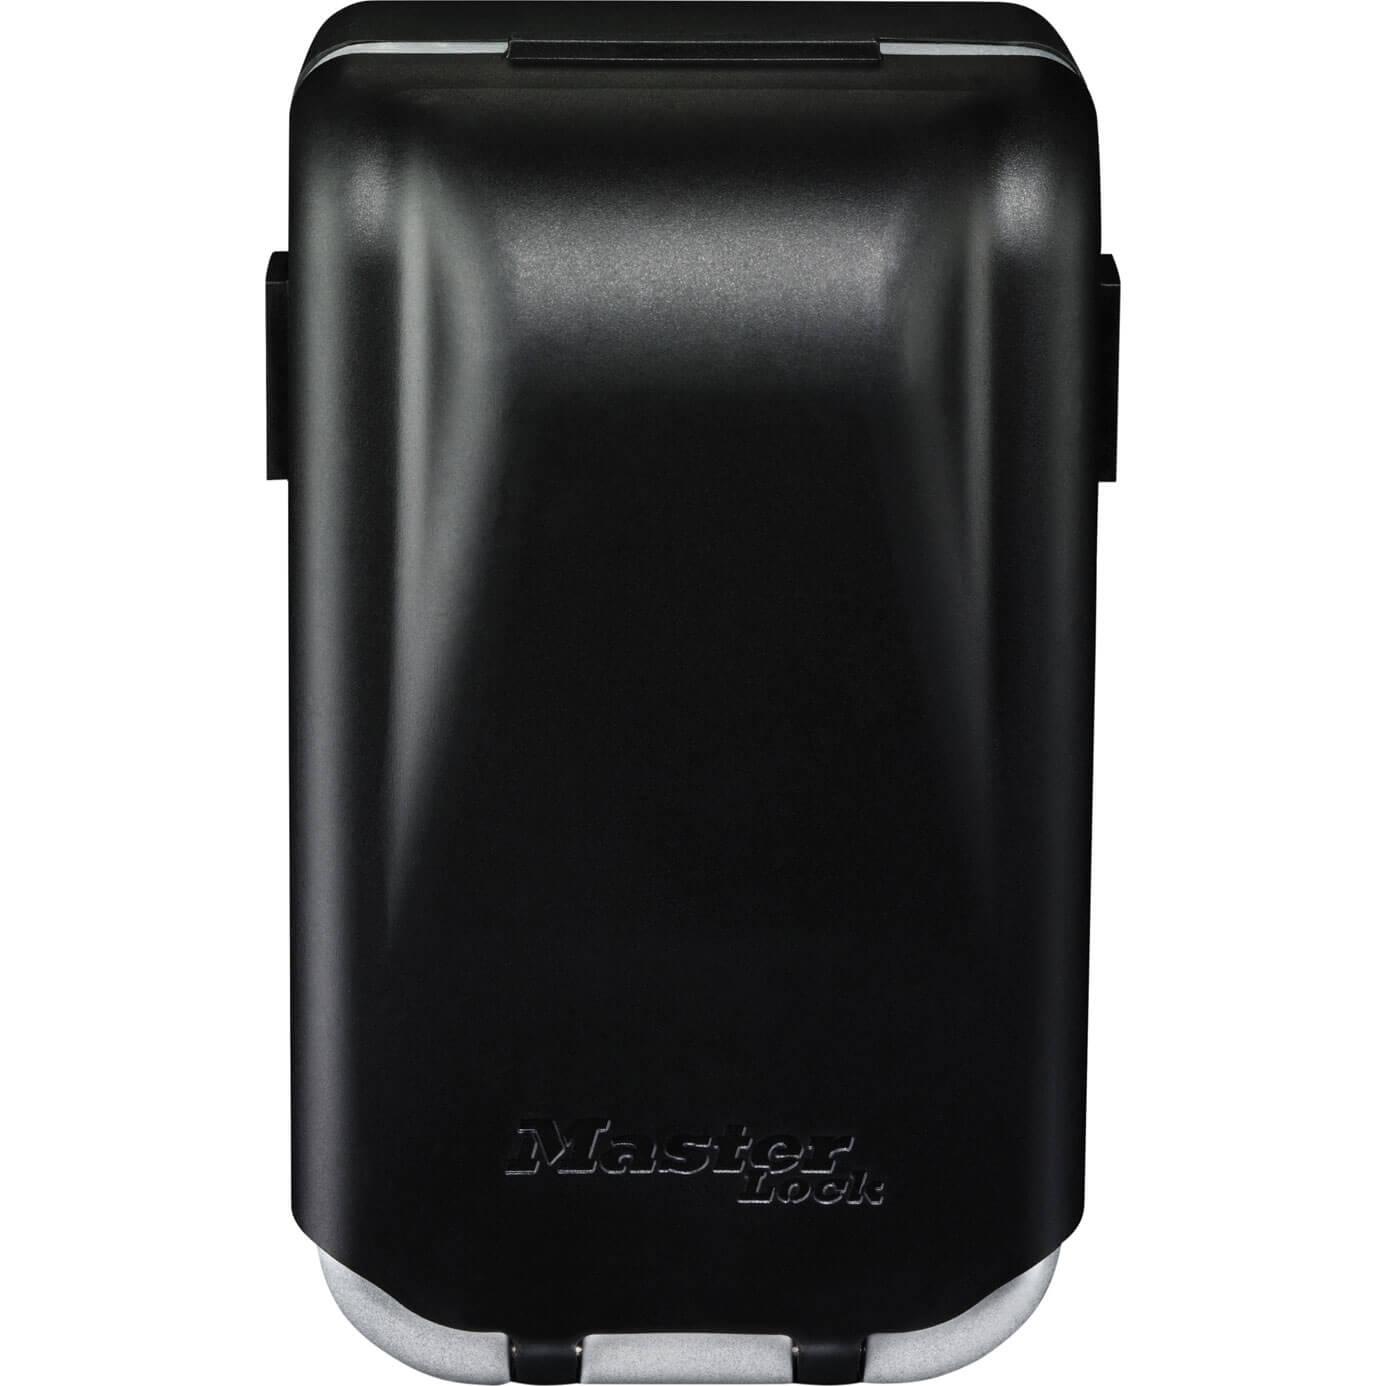 Image of Masterlock Light Up Dial Select Access Wall Mounted Key Box